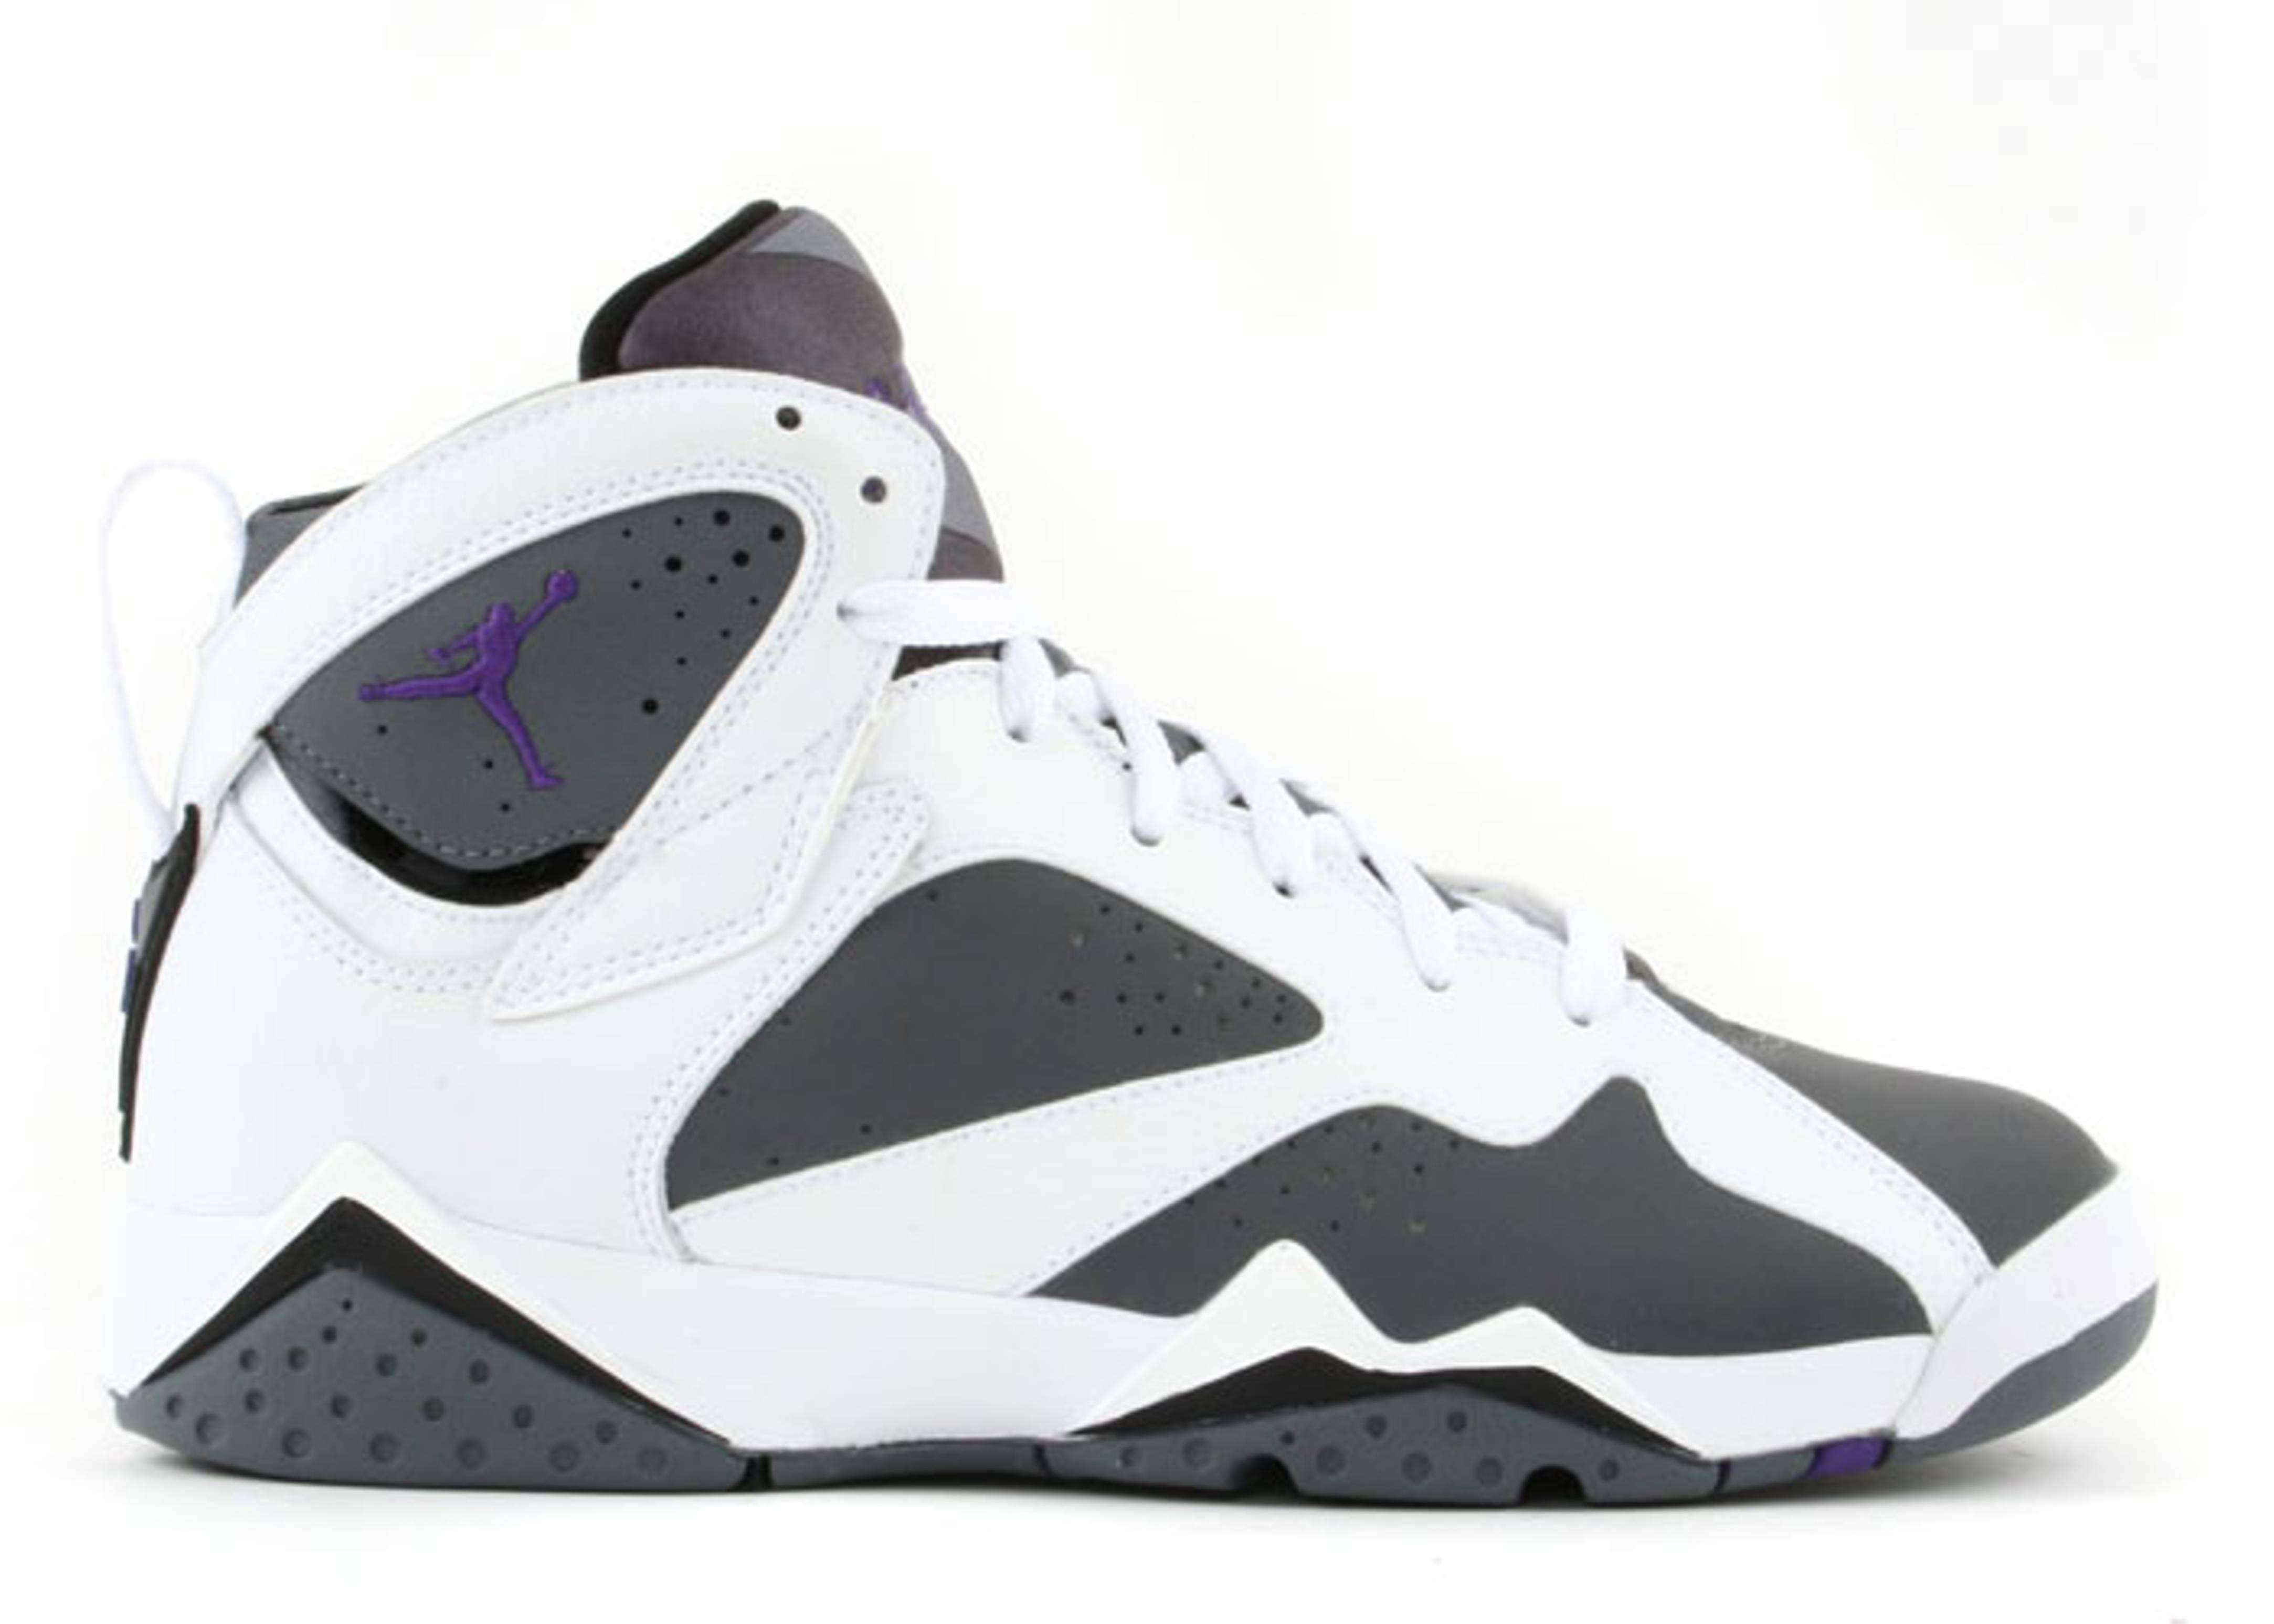 timeless design 0f1d8 a6933 ... canada air jordan 7 purple grey purple 06152 f0962